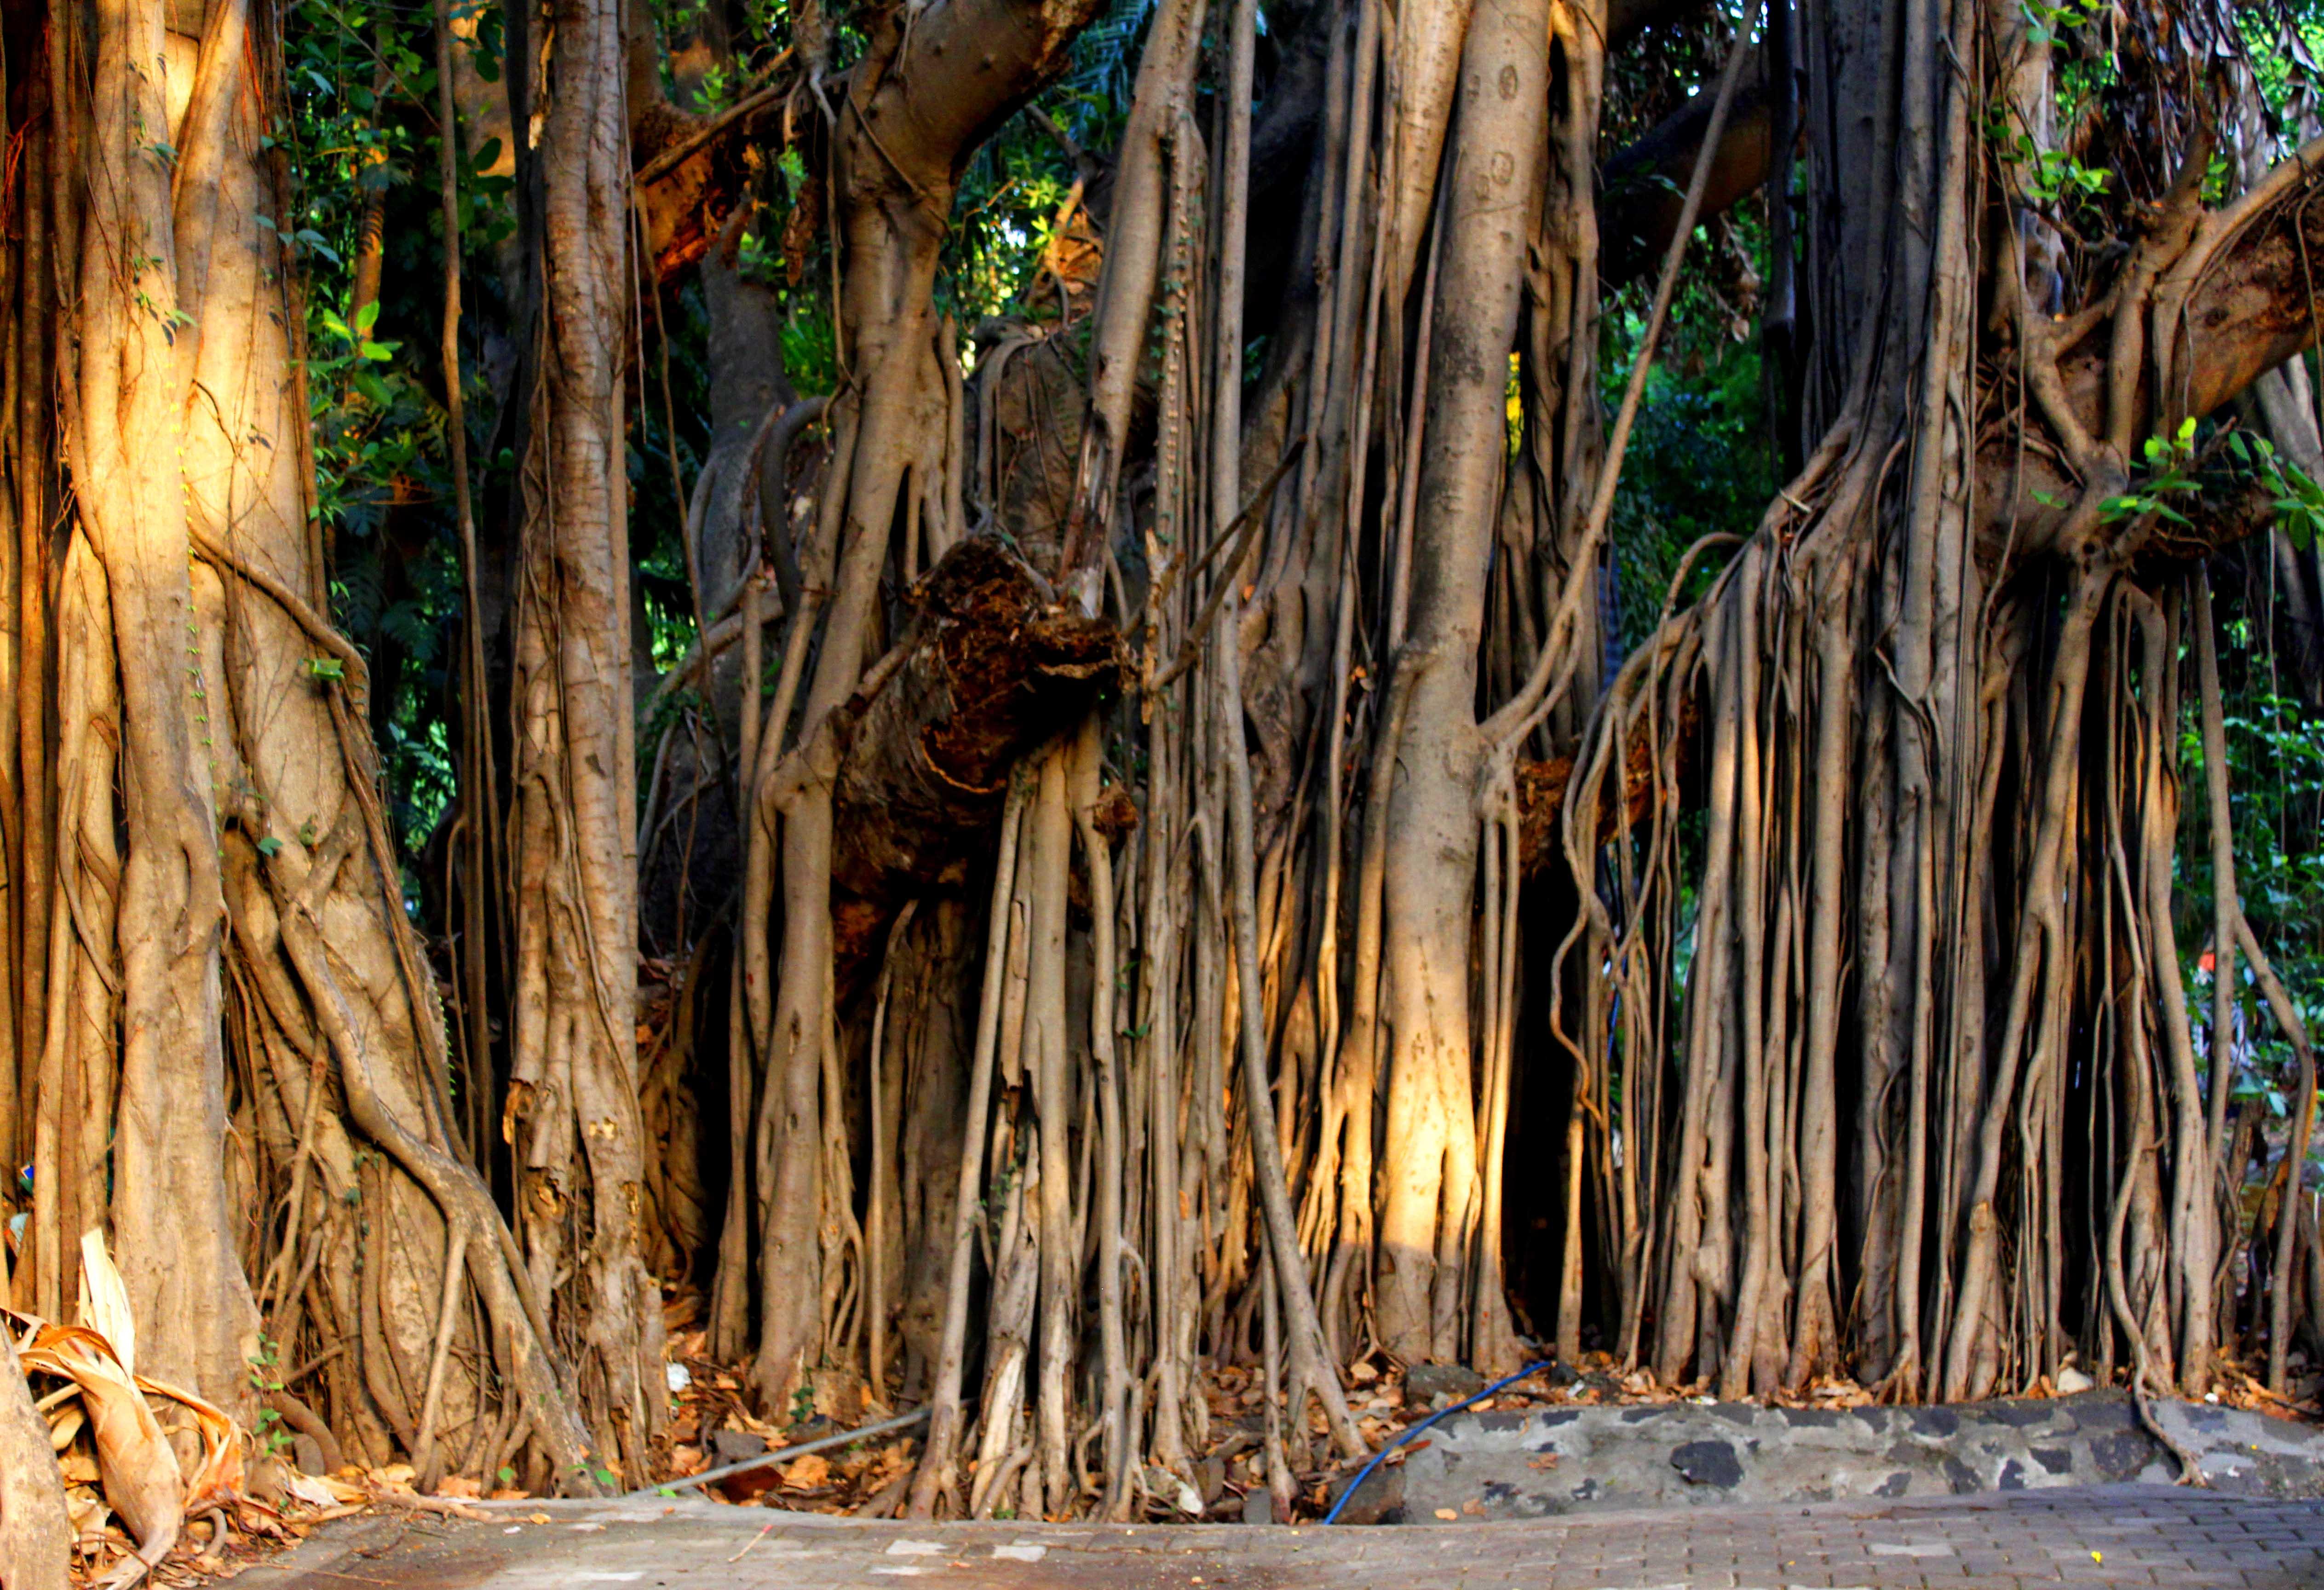 File:Empress Garden Banyan Trees.jpg - Wikimedia Commons